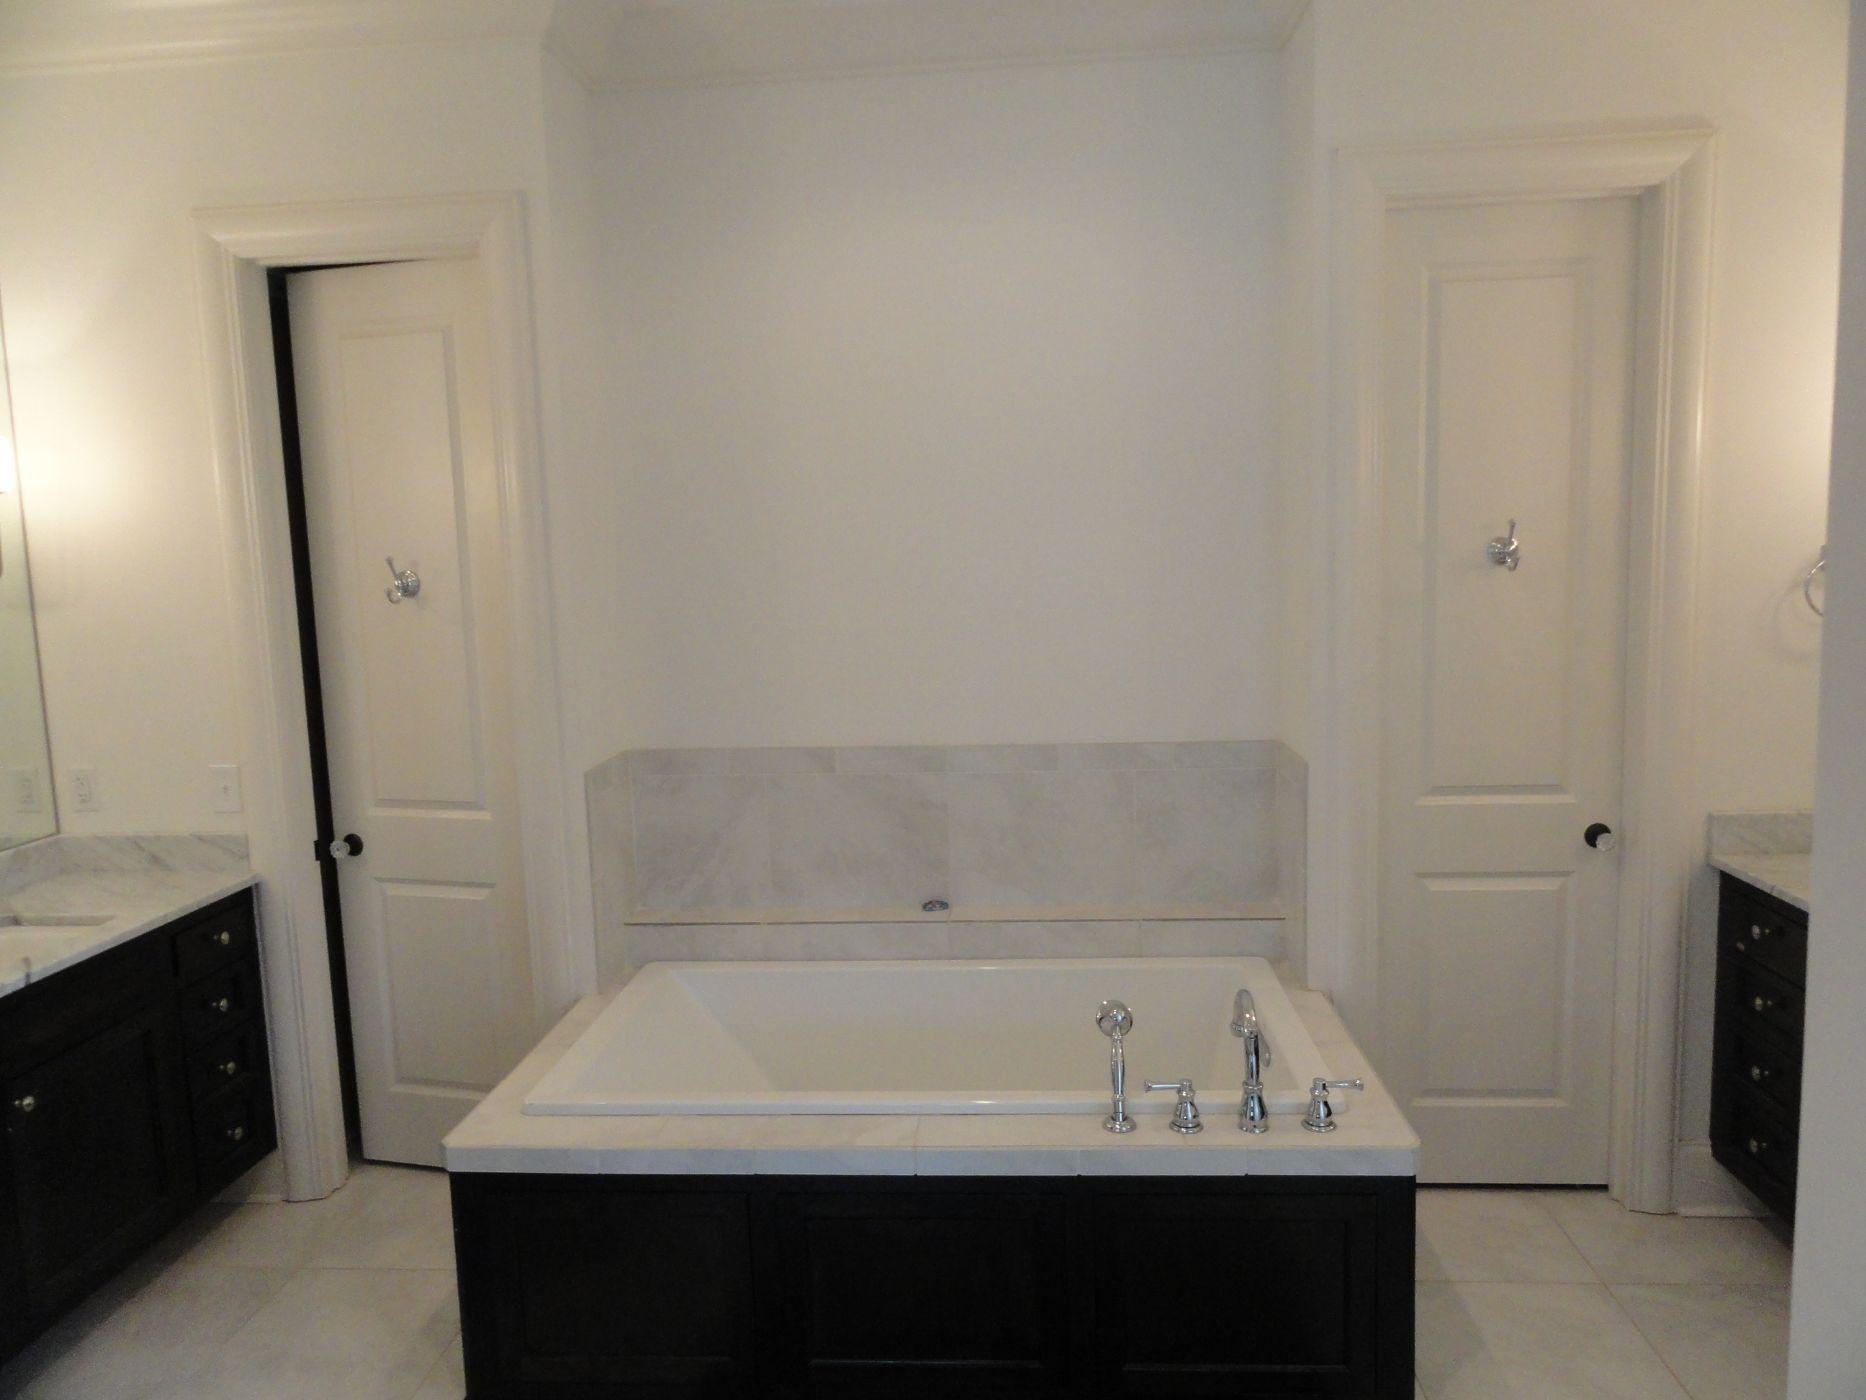 Bathroom Sinks Jackson Ms guckert realty group, llc presents: guckert realty group, llc real